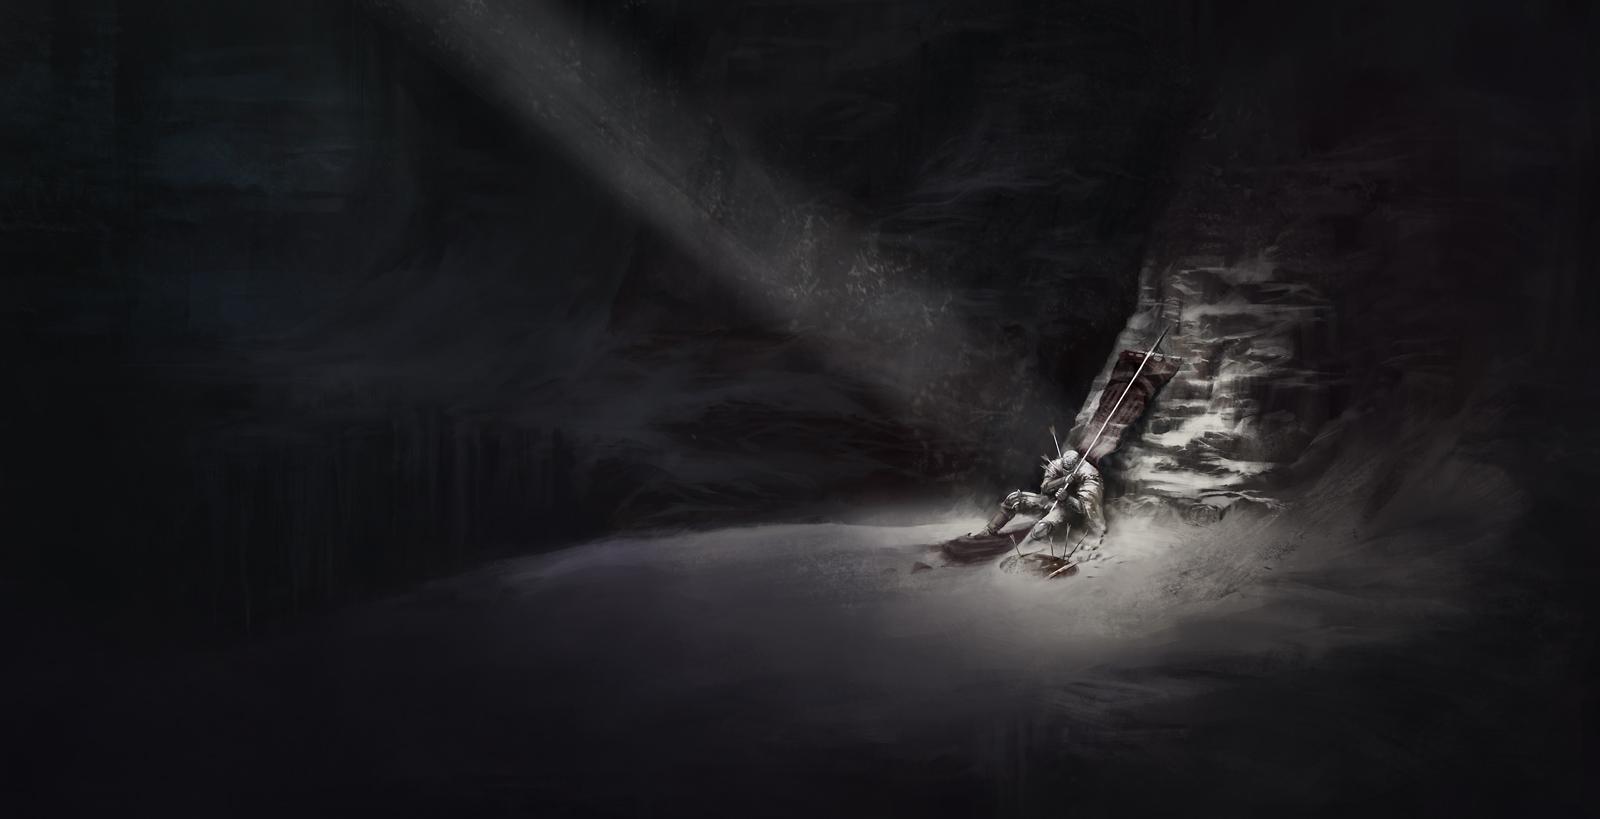 knightsnowdeadorwhaever by Grobelski